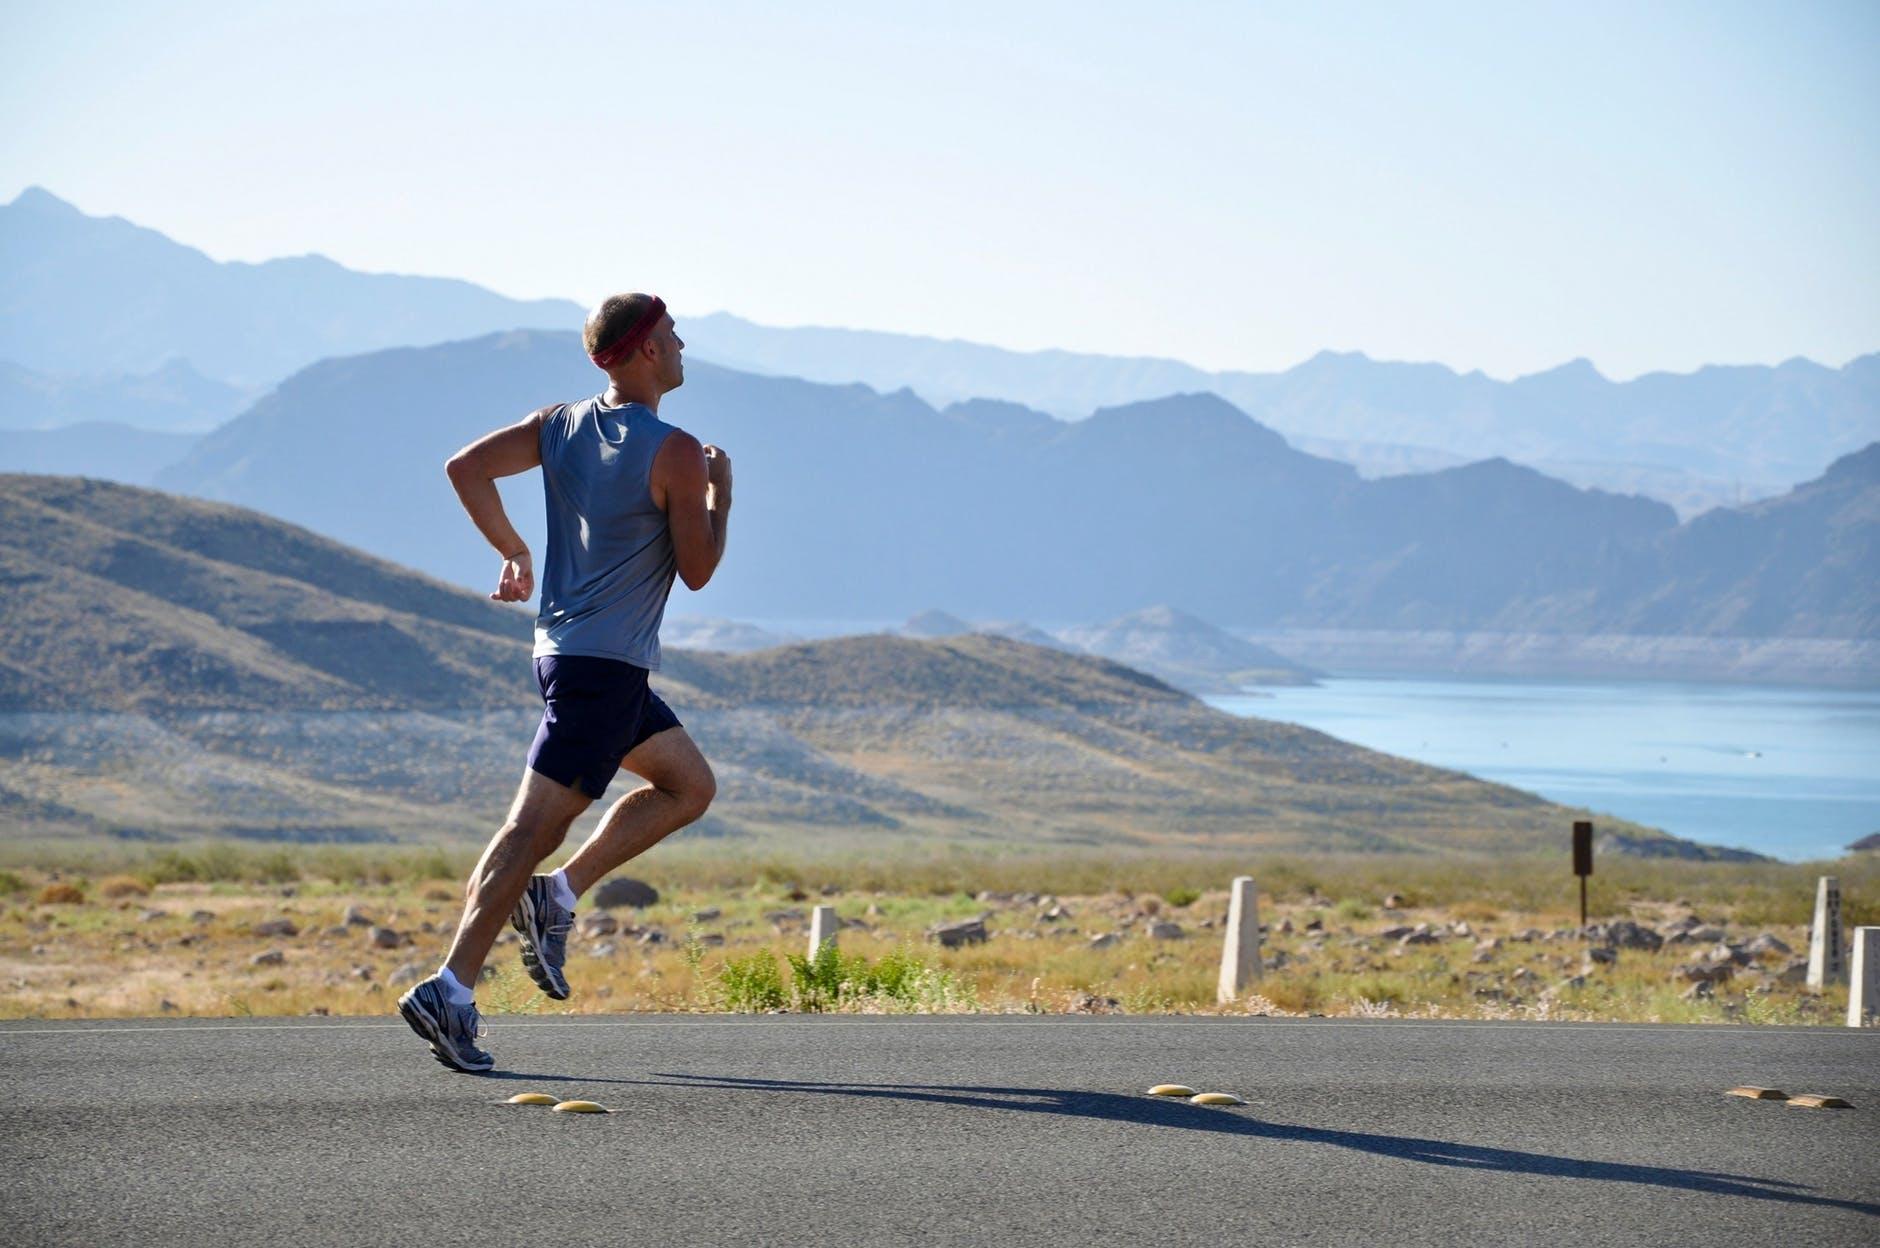 adventure athlete athletic daylight